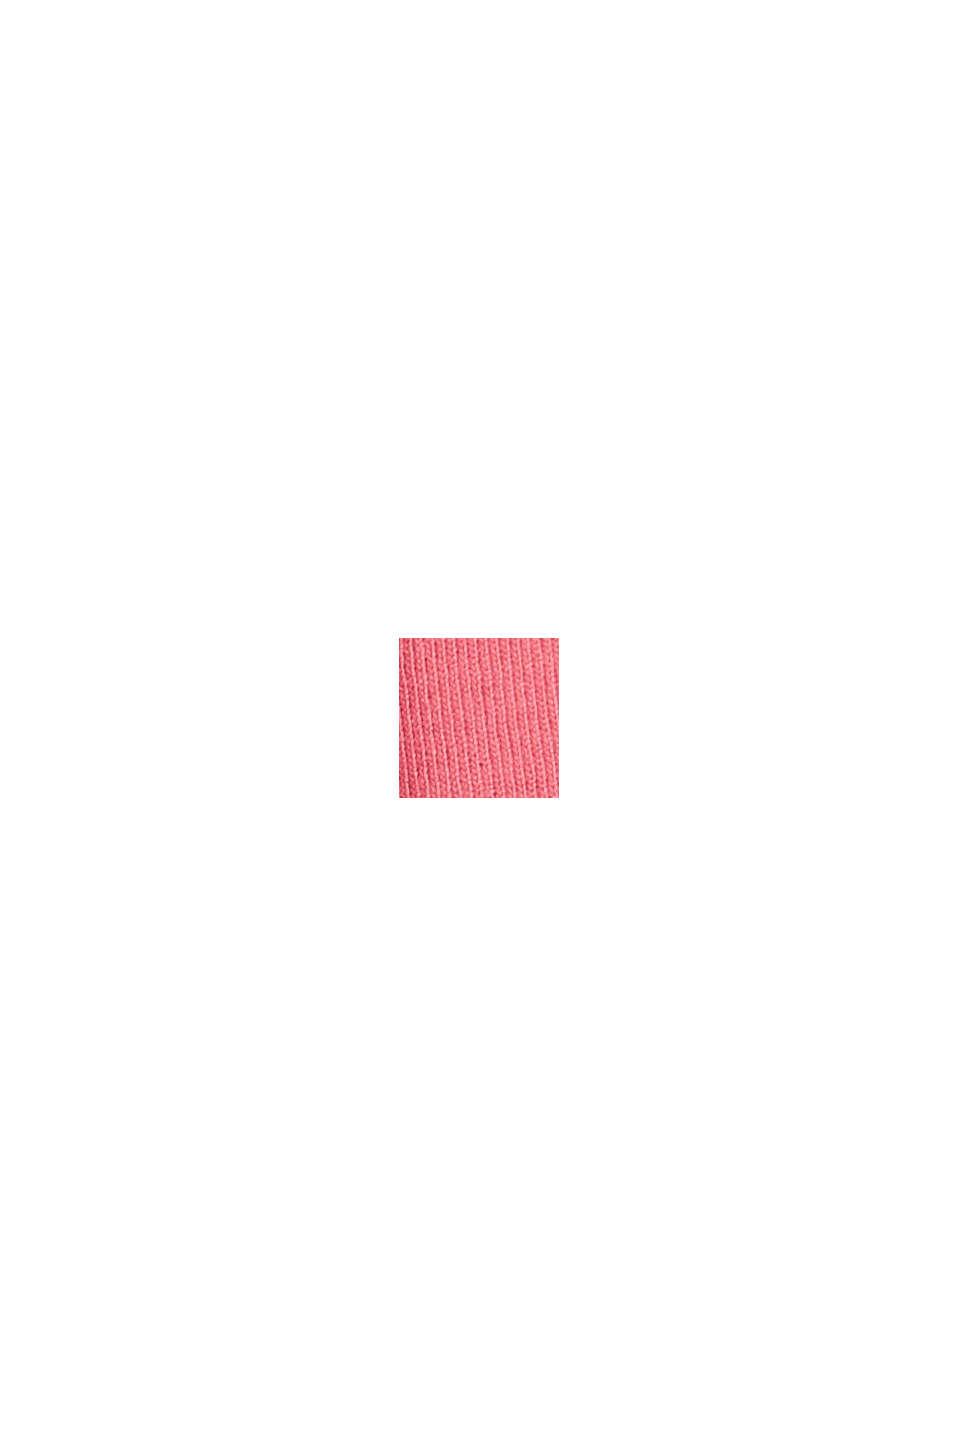 Maglia active con inserto in mesh, CORAL RED, swatch